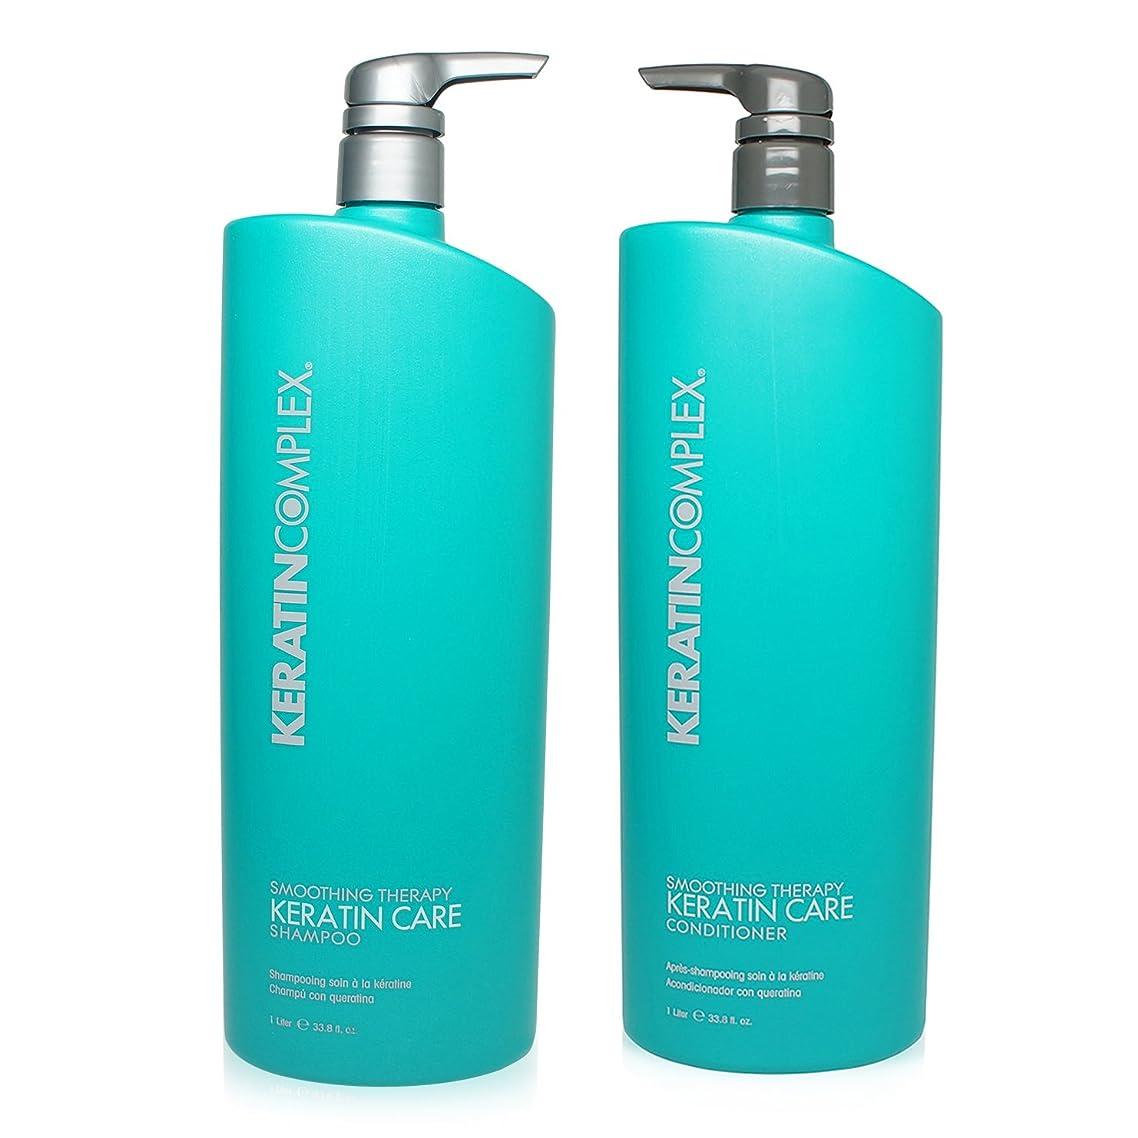 Keratin Complex Keratin Care Shampoo and Conditioner Duo 33oz set